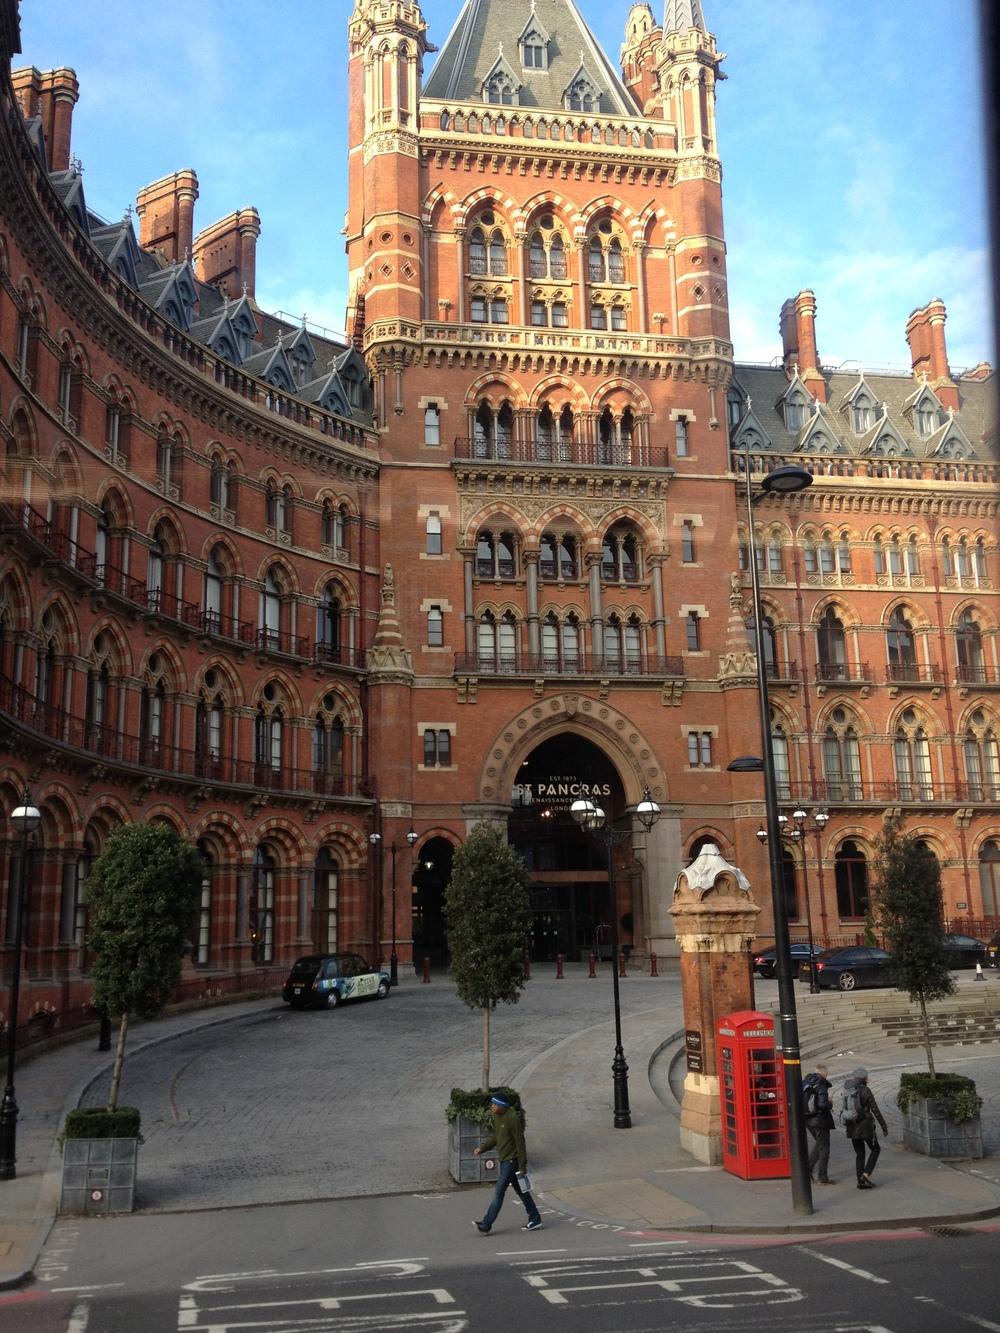 London St. Pancras Renaissance Hotel